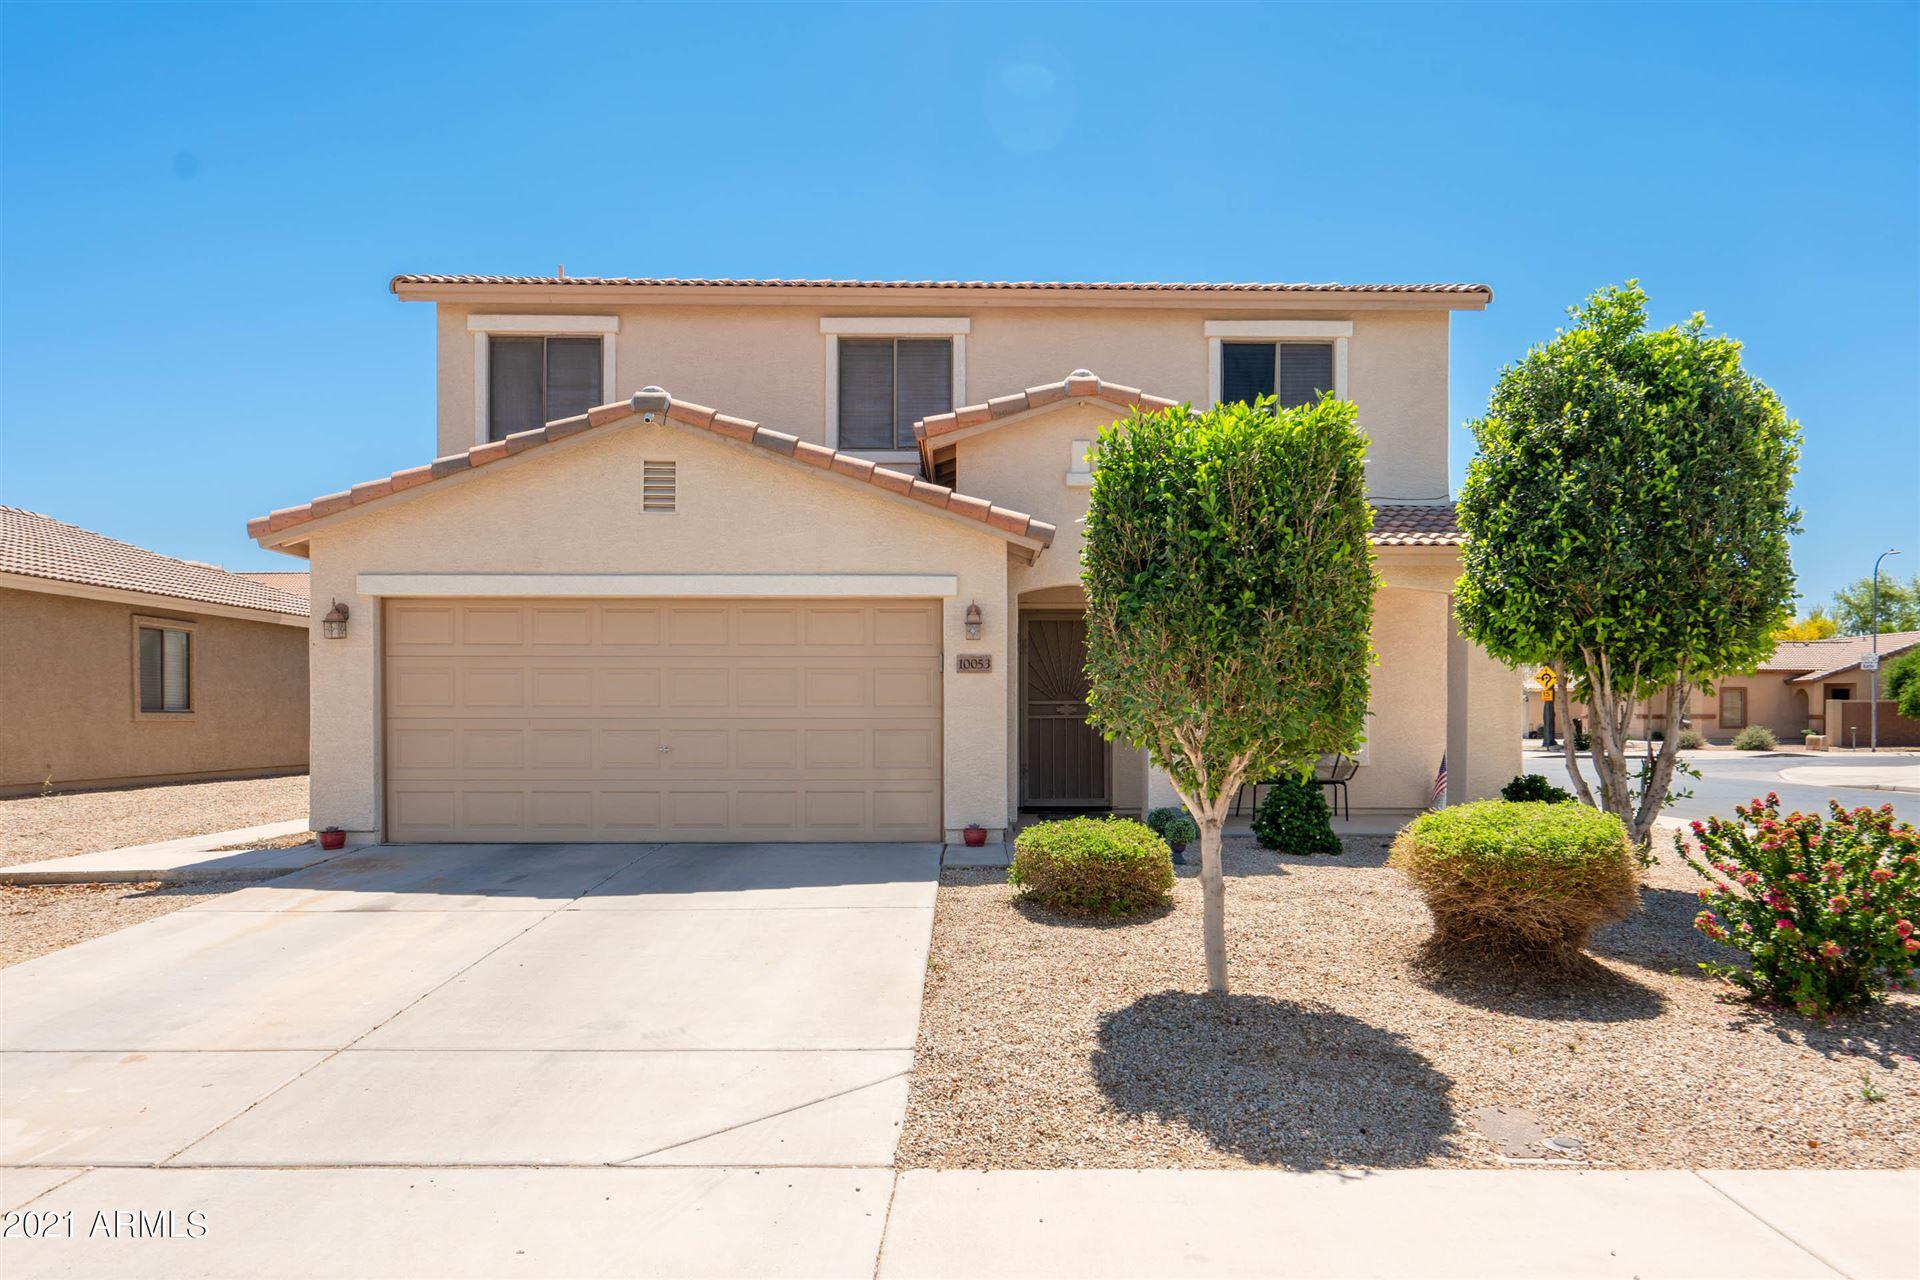 10053 W CROWN KING Road, Tolleson, AZ 85353 - MLS#: 6234395